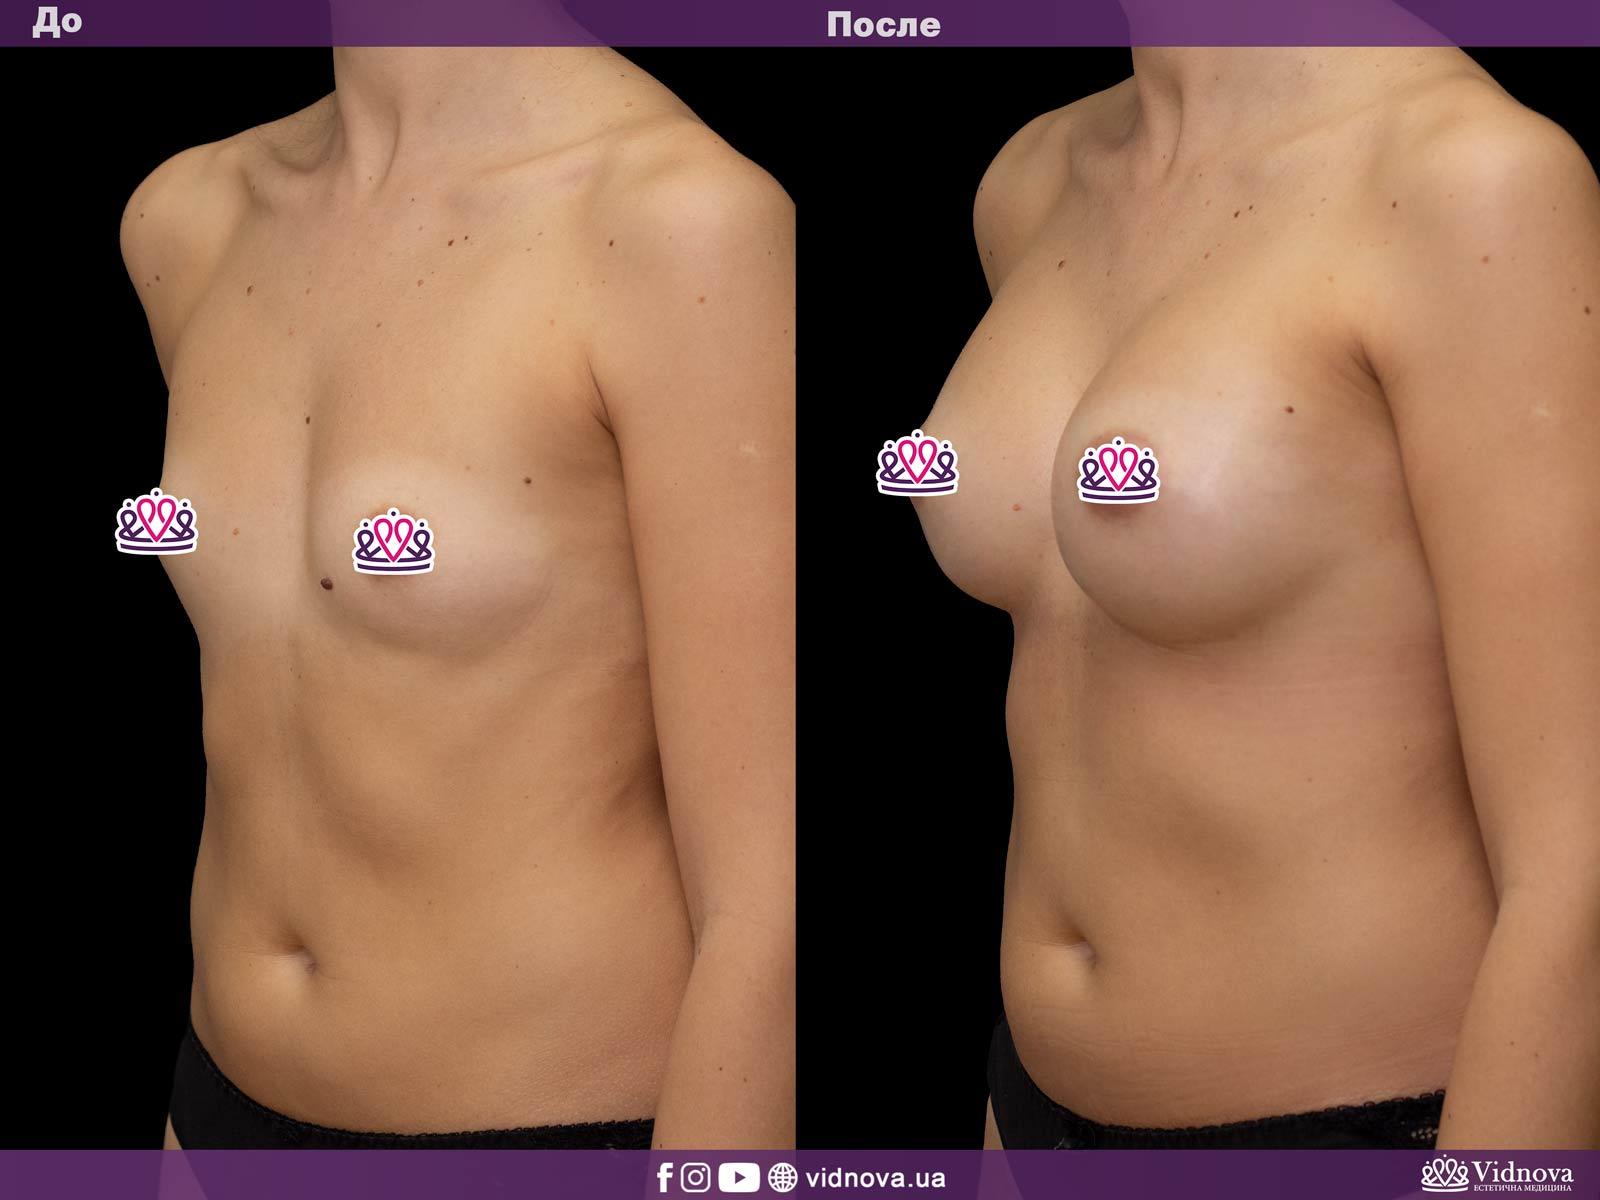 Увеличение груди: Фото ДО и ПОСЛЕ - Пример №21-2 - Клиника Vidnova